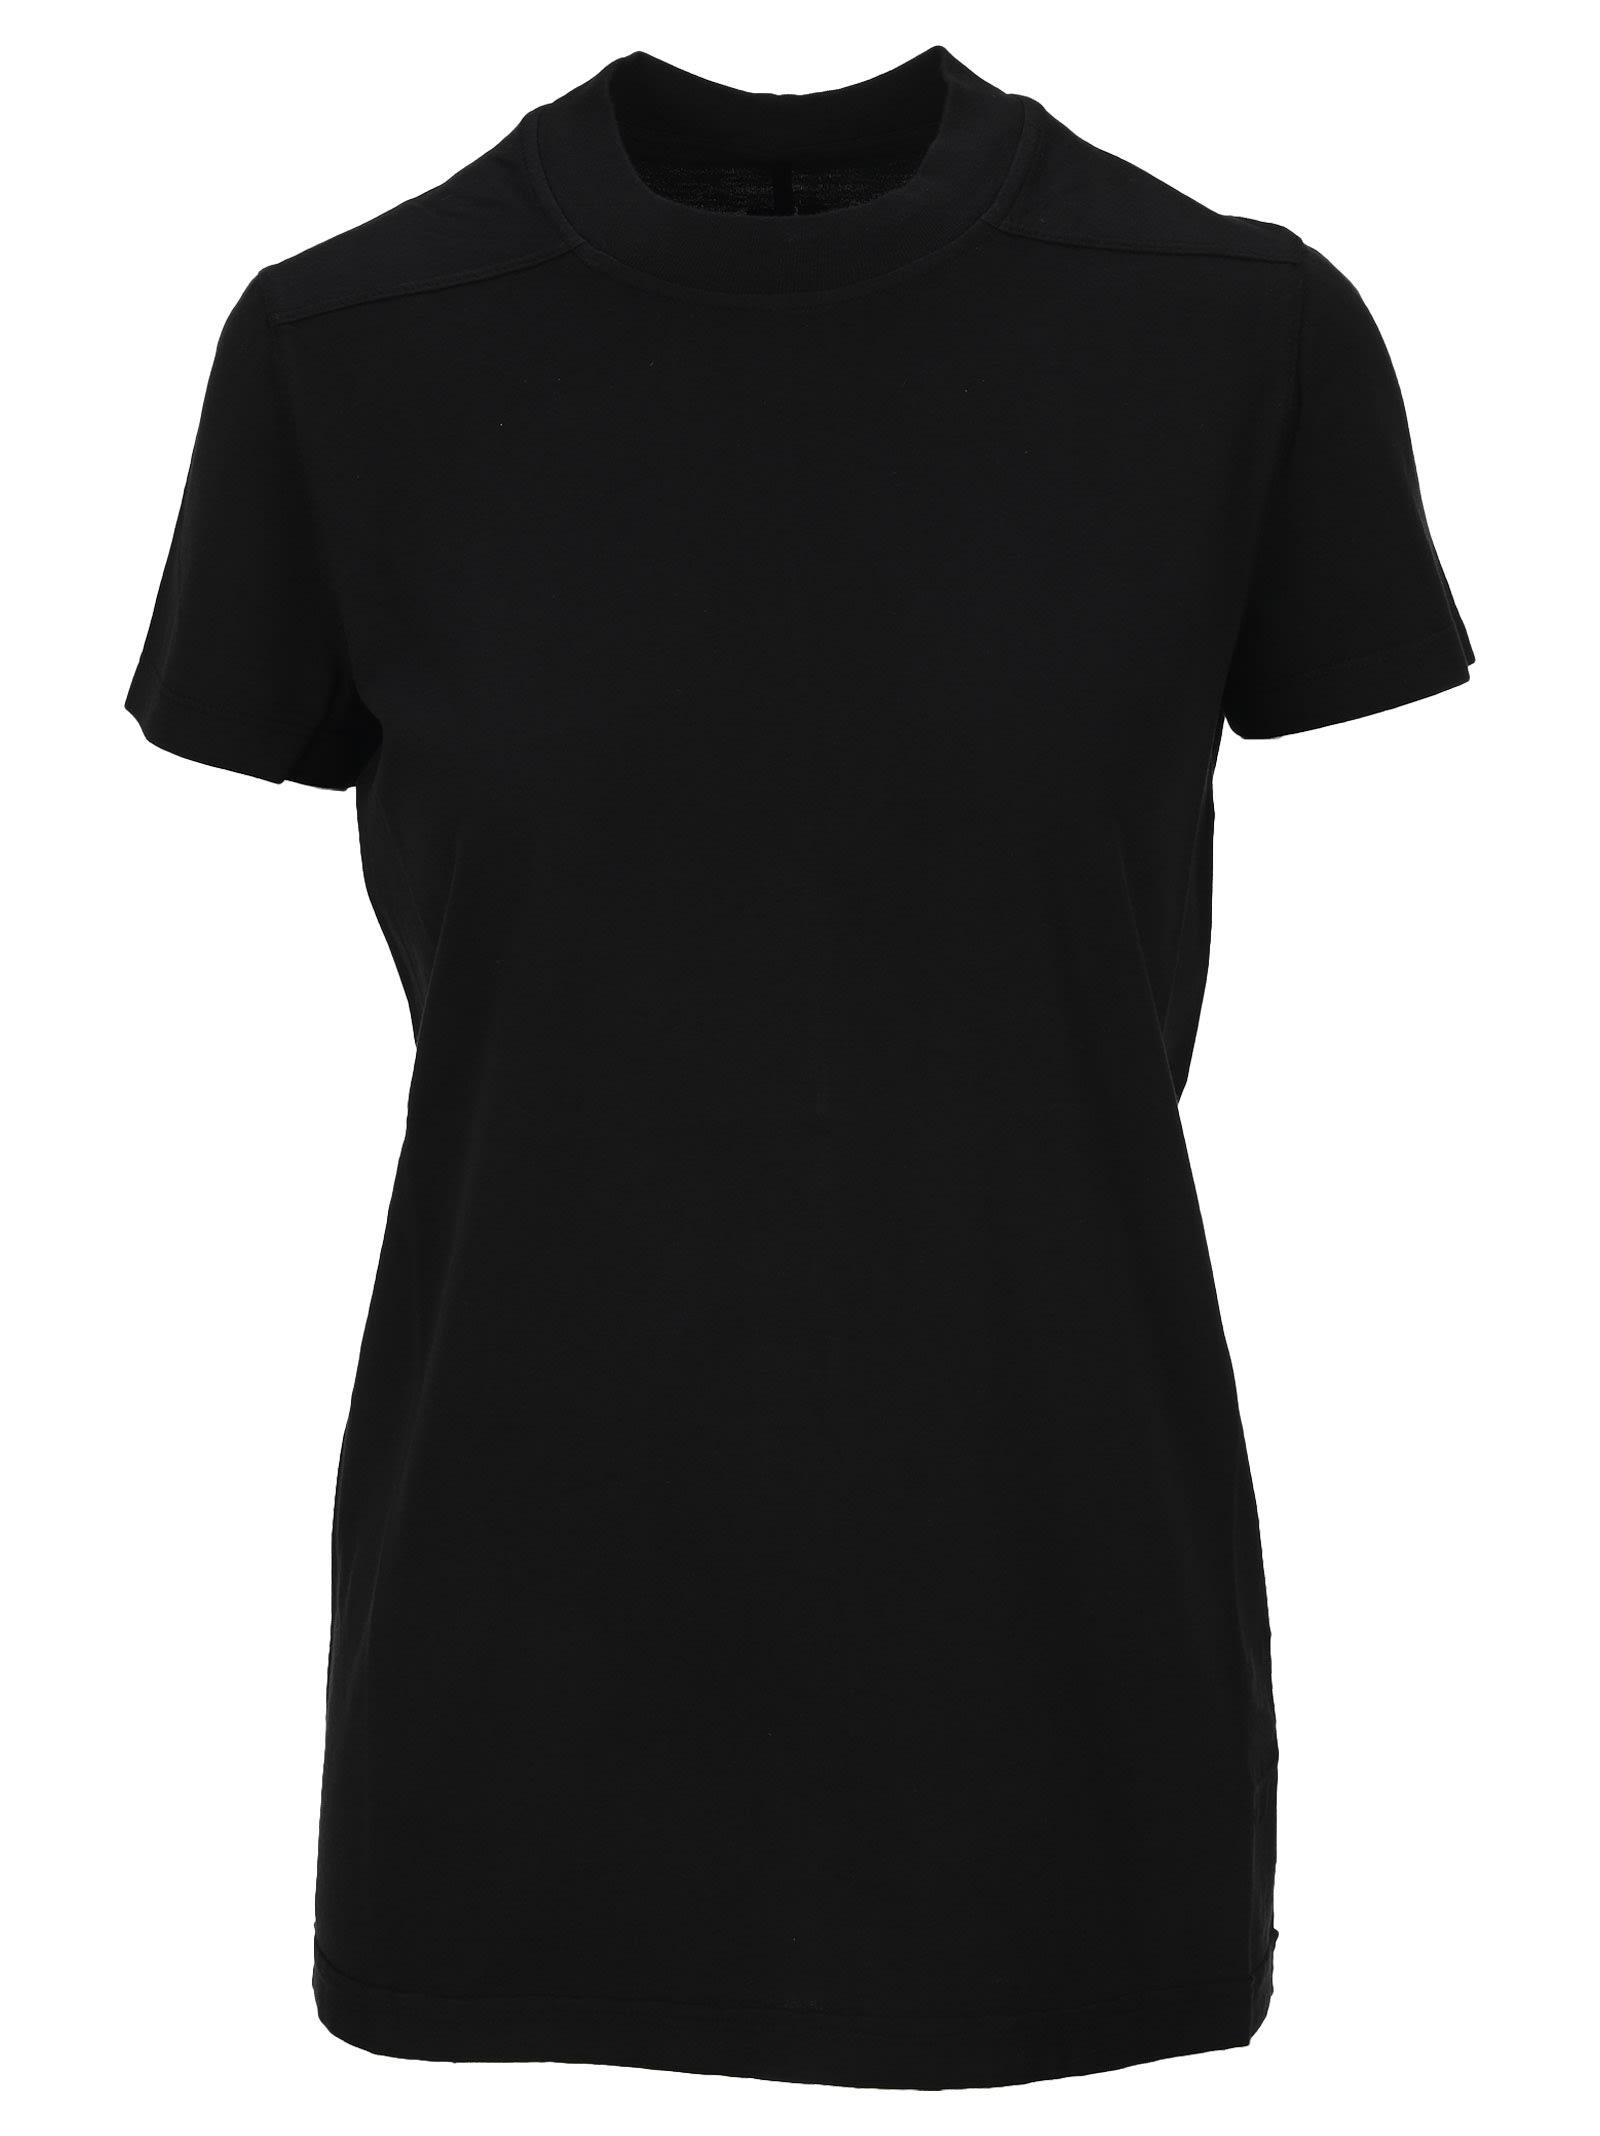 Drkshdw Dark Shadow Jersey T-shirt In Black